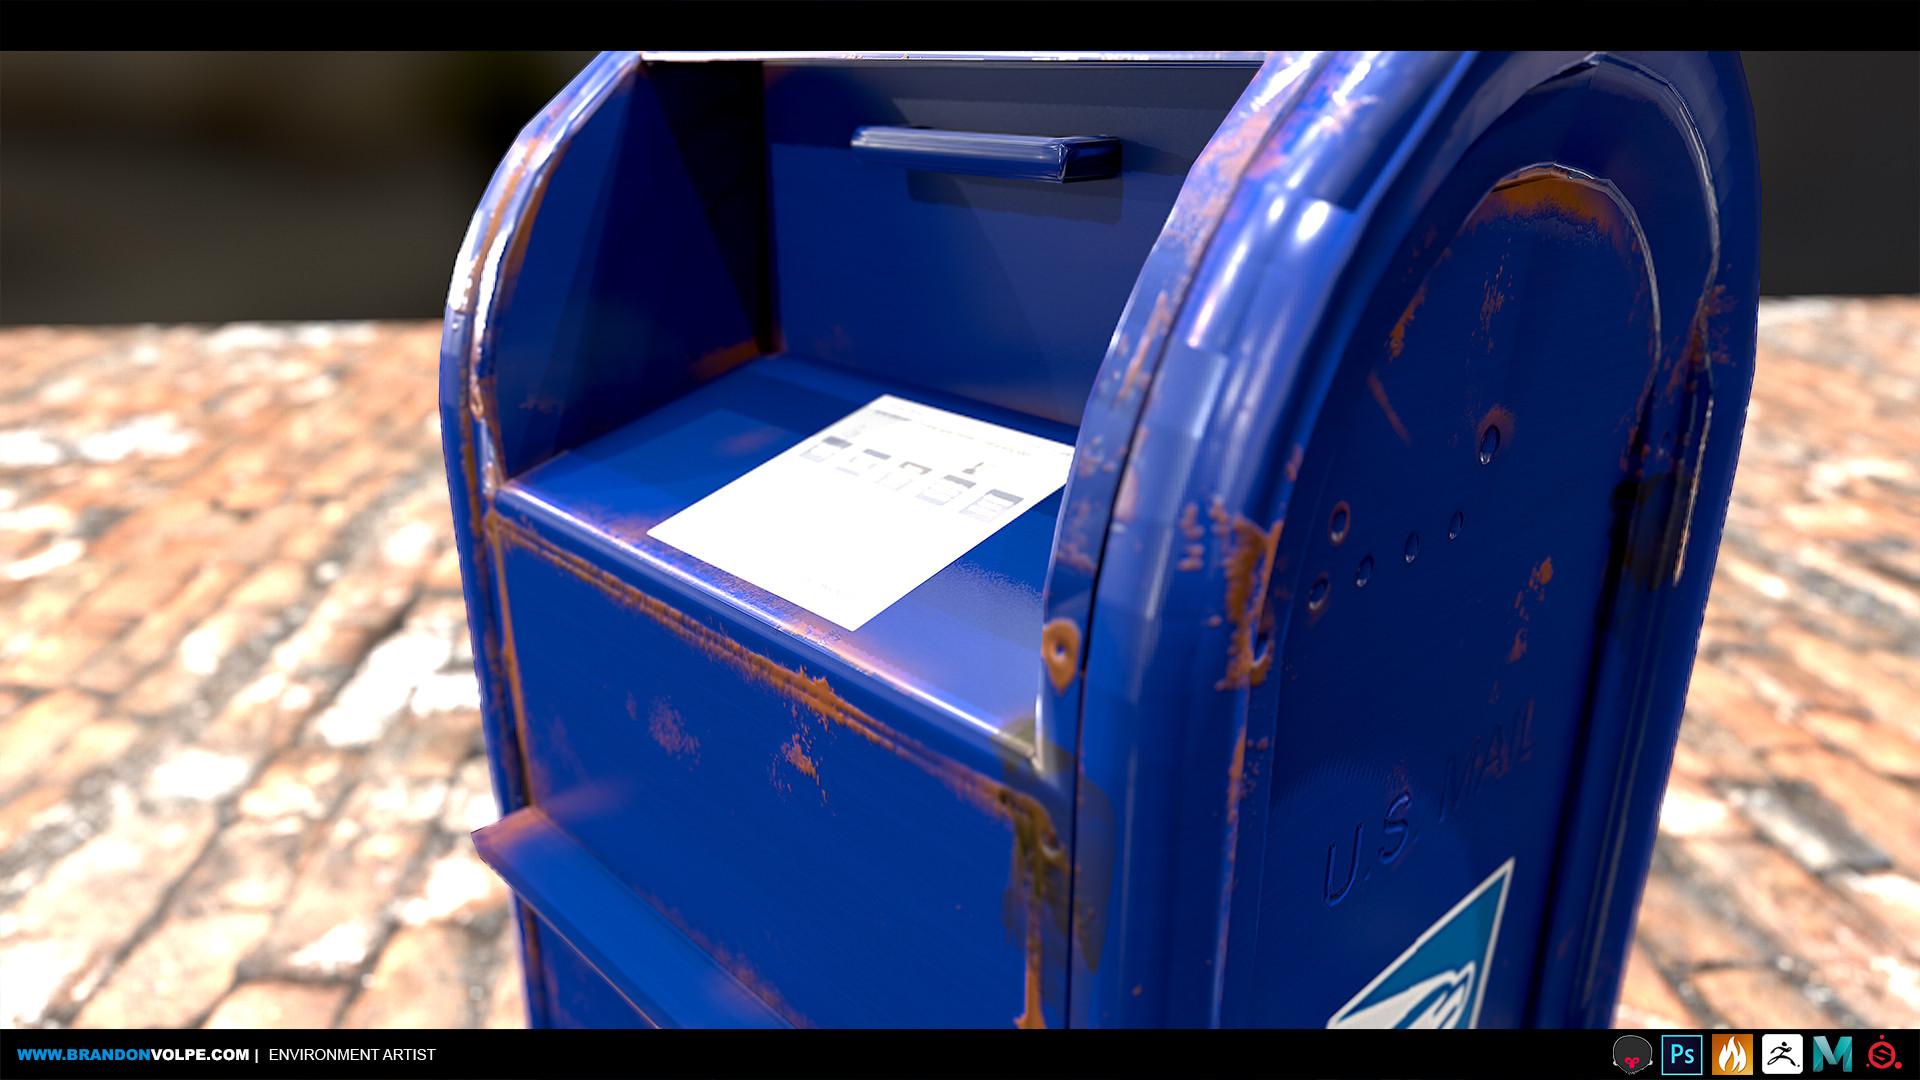 Brandon volpe brandon volpe mailbox 7